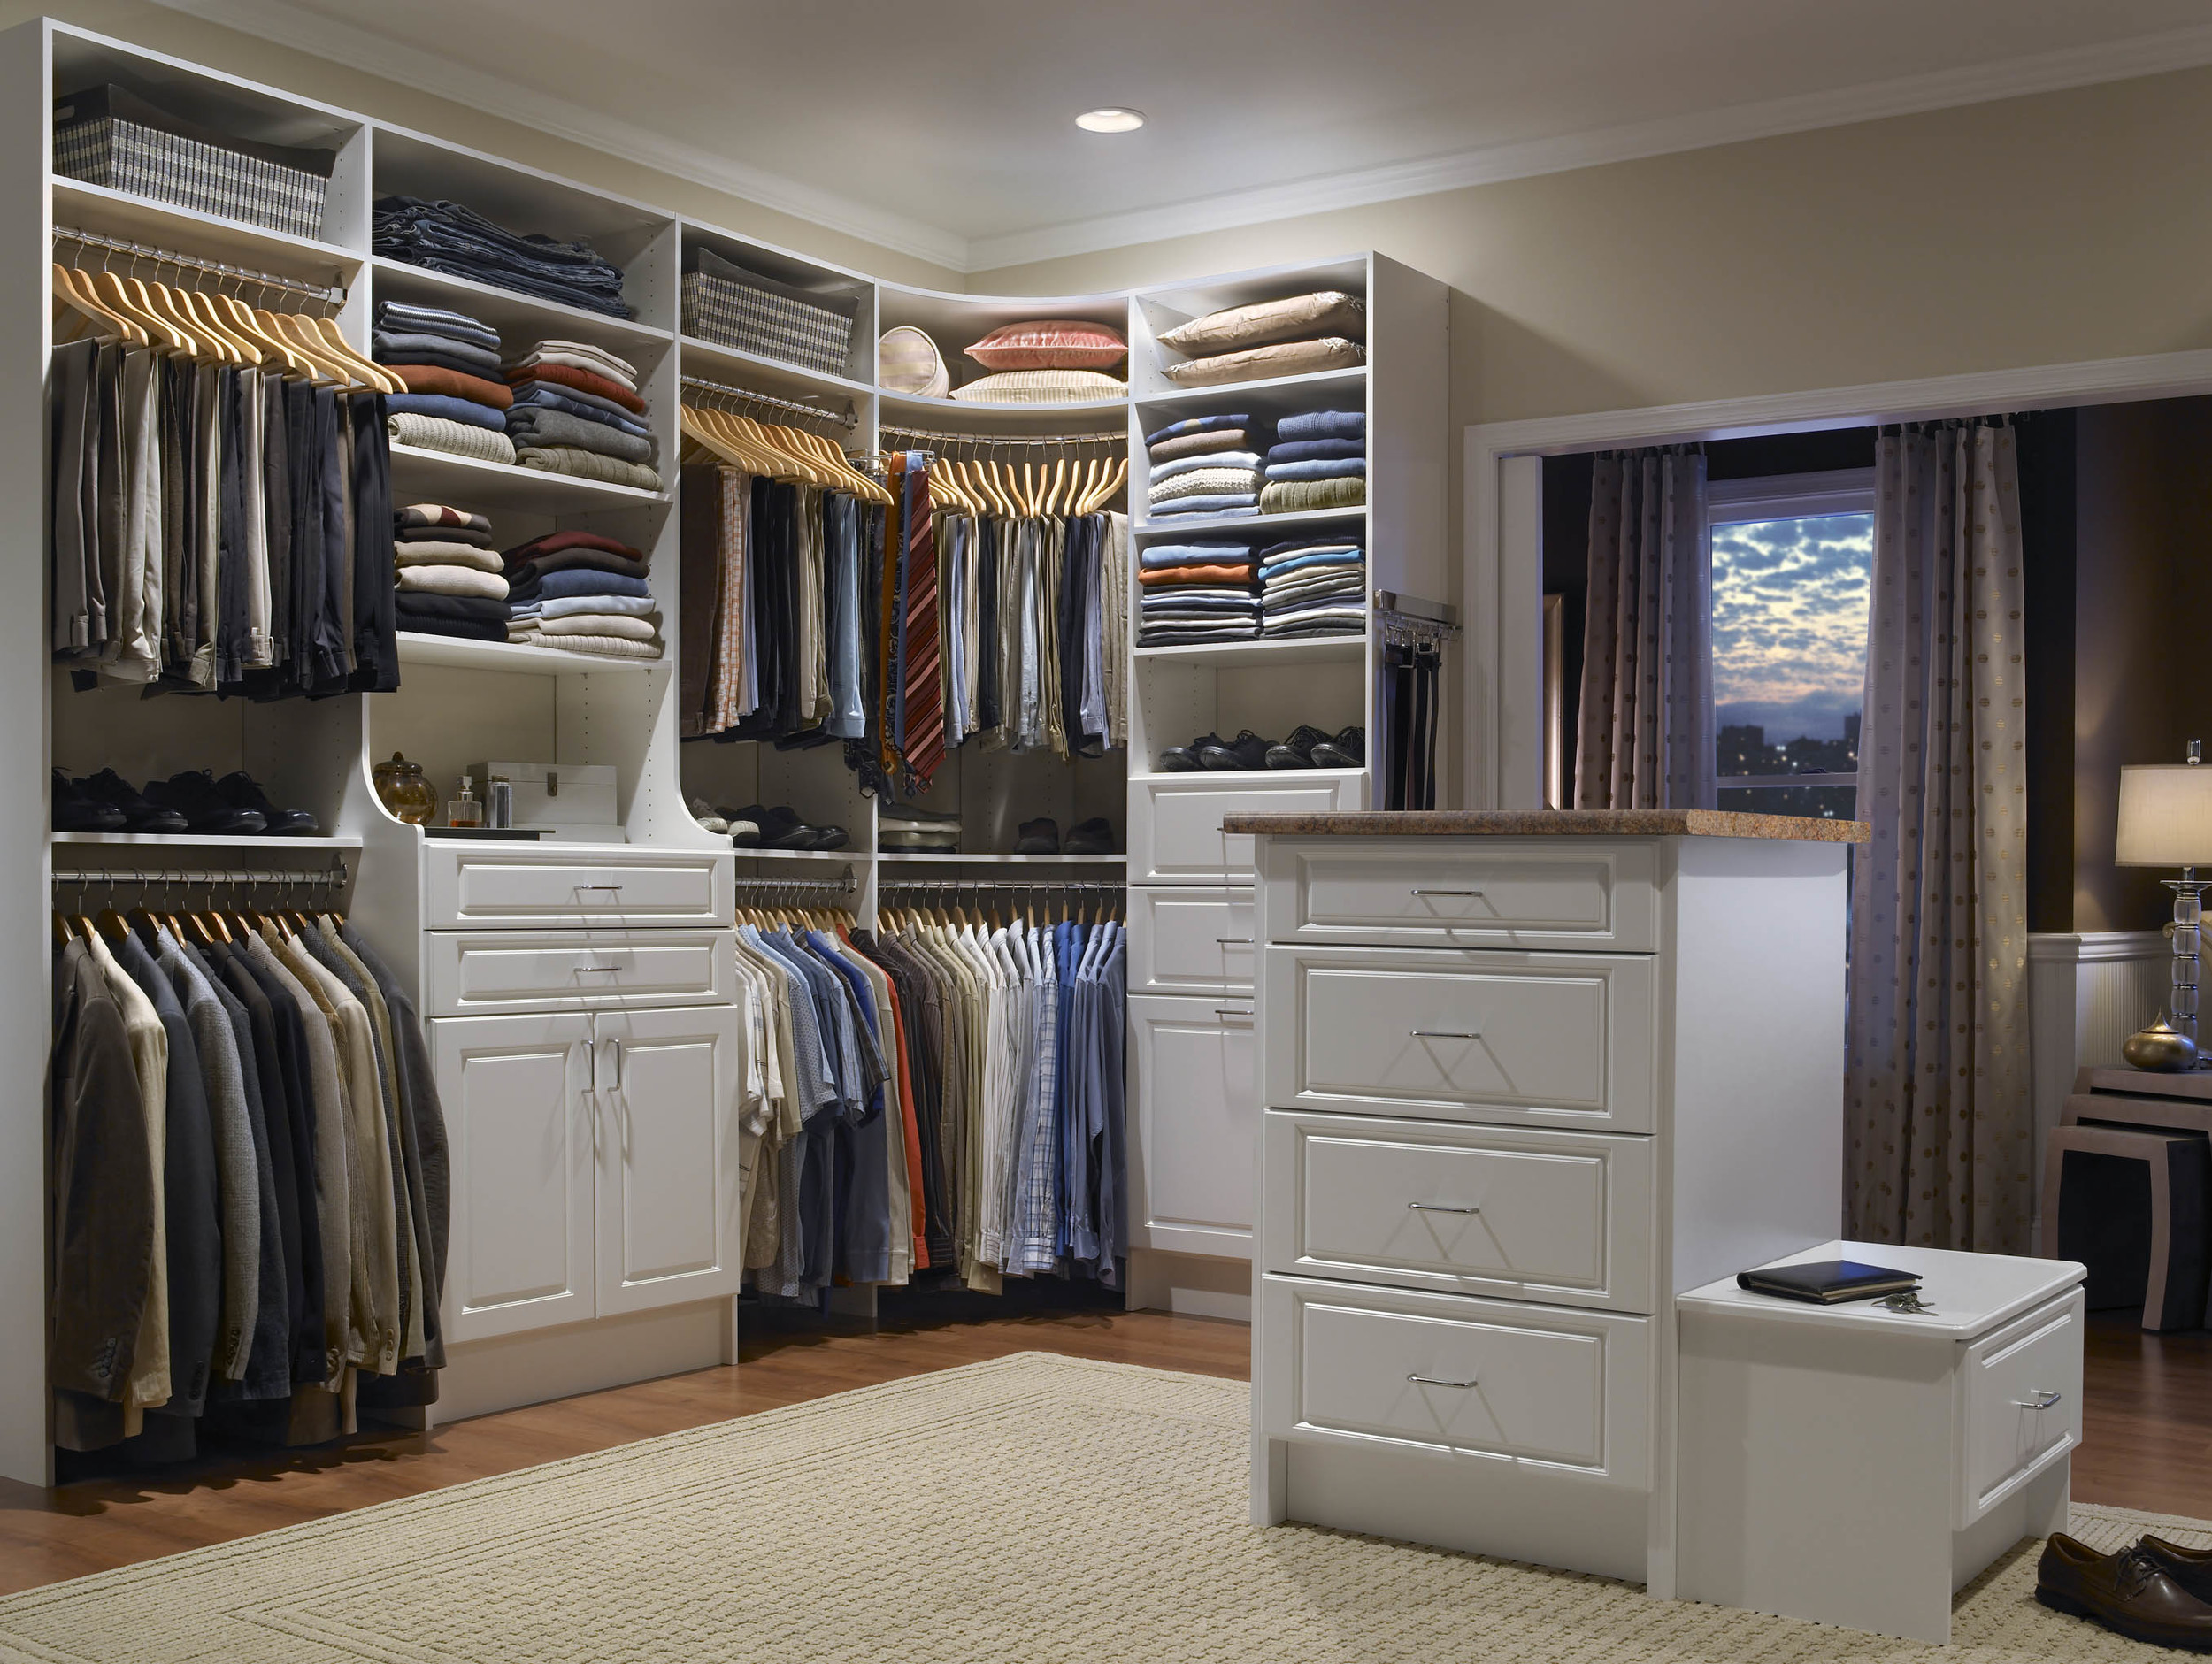 closet-2713x2041-custom-bedroom-closet-systems-charlotte-nc-closet-maid-urumix.com.jpg